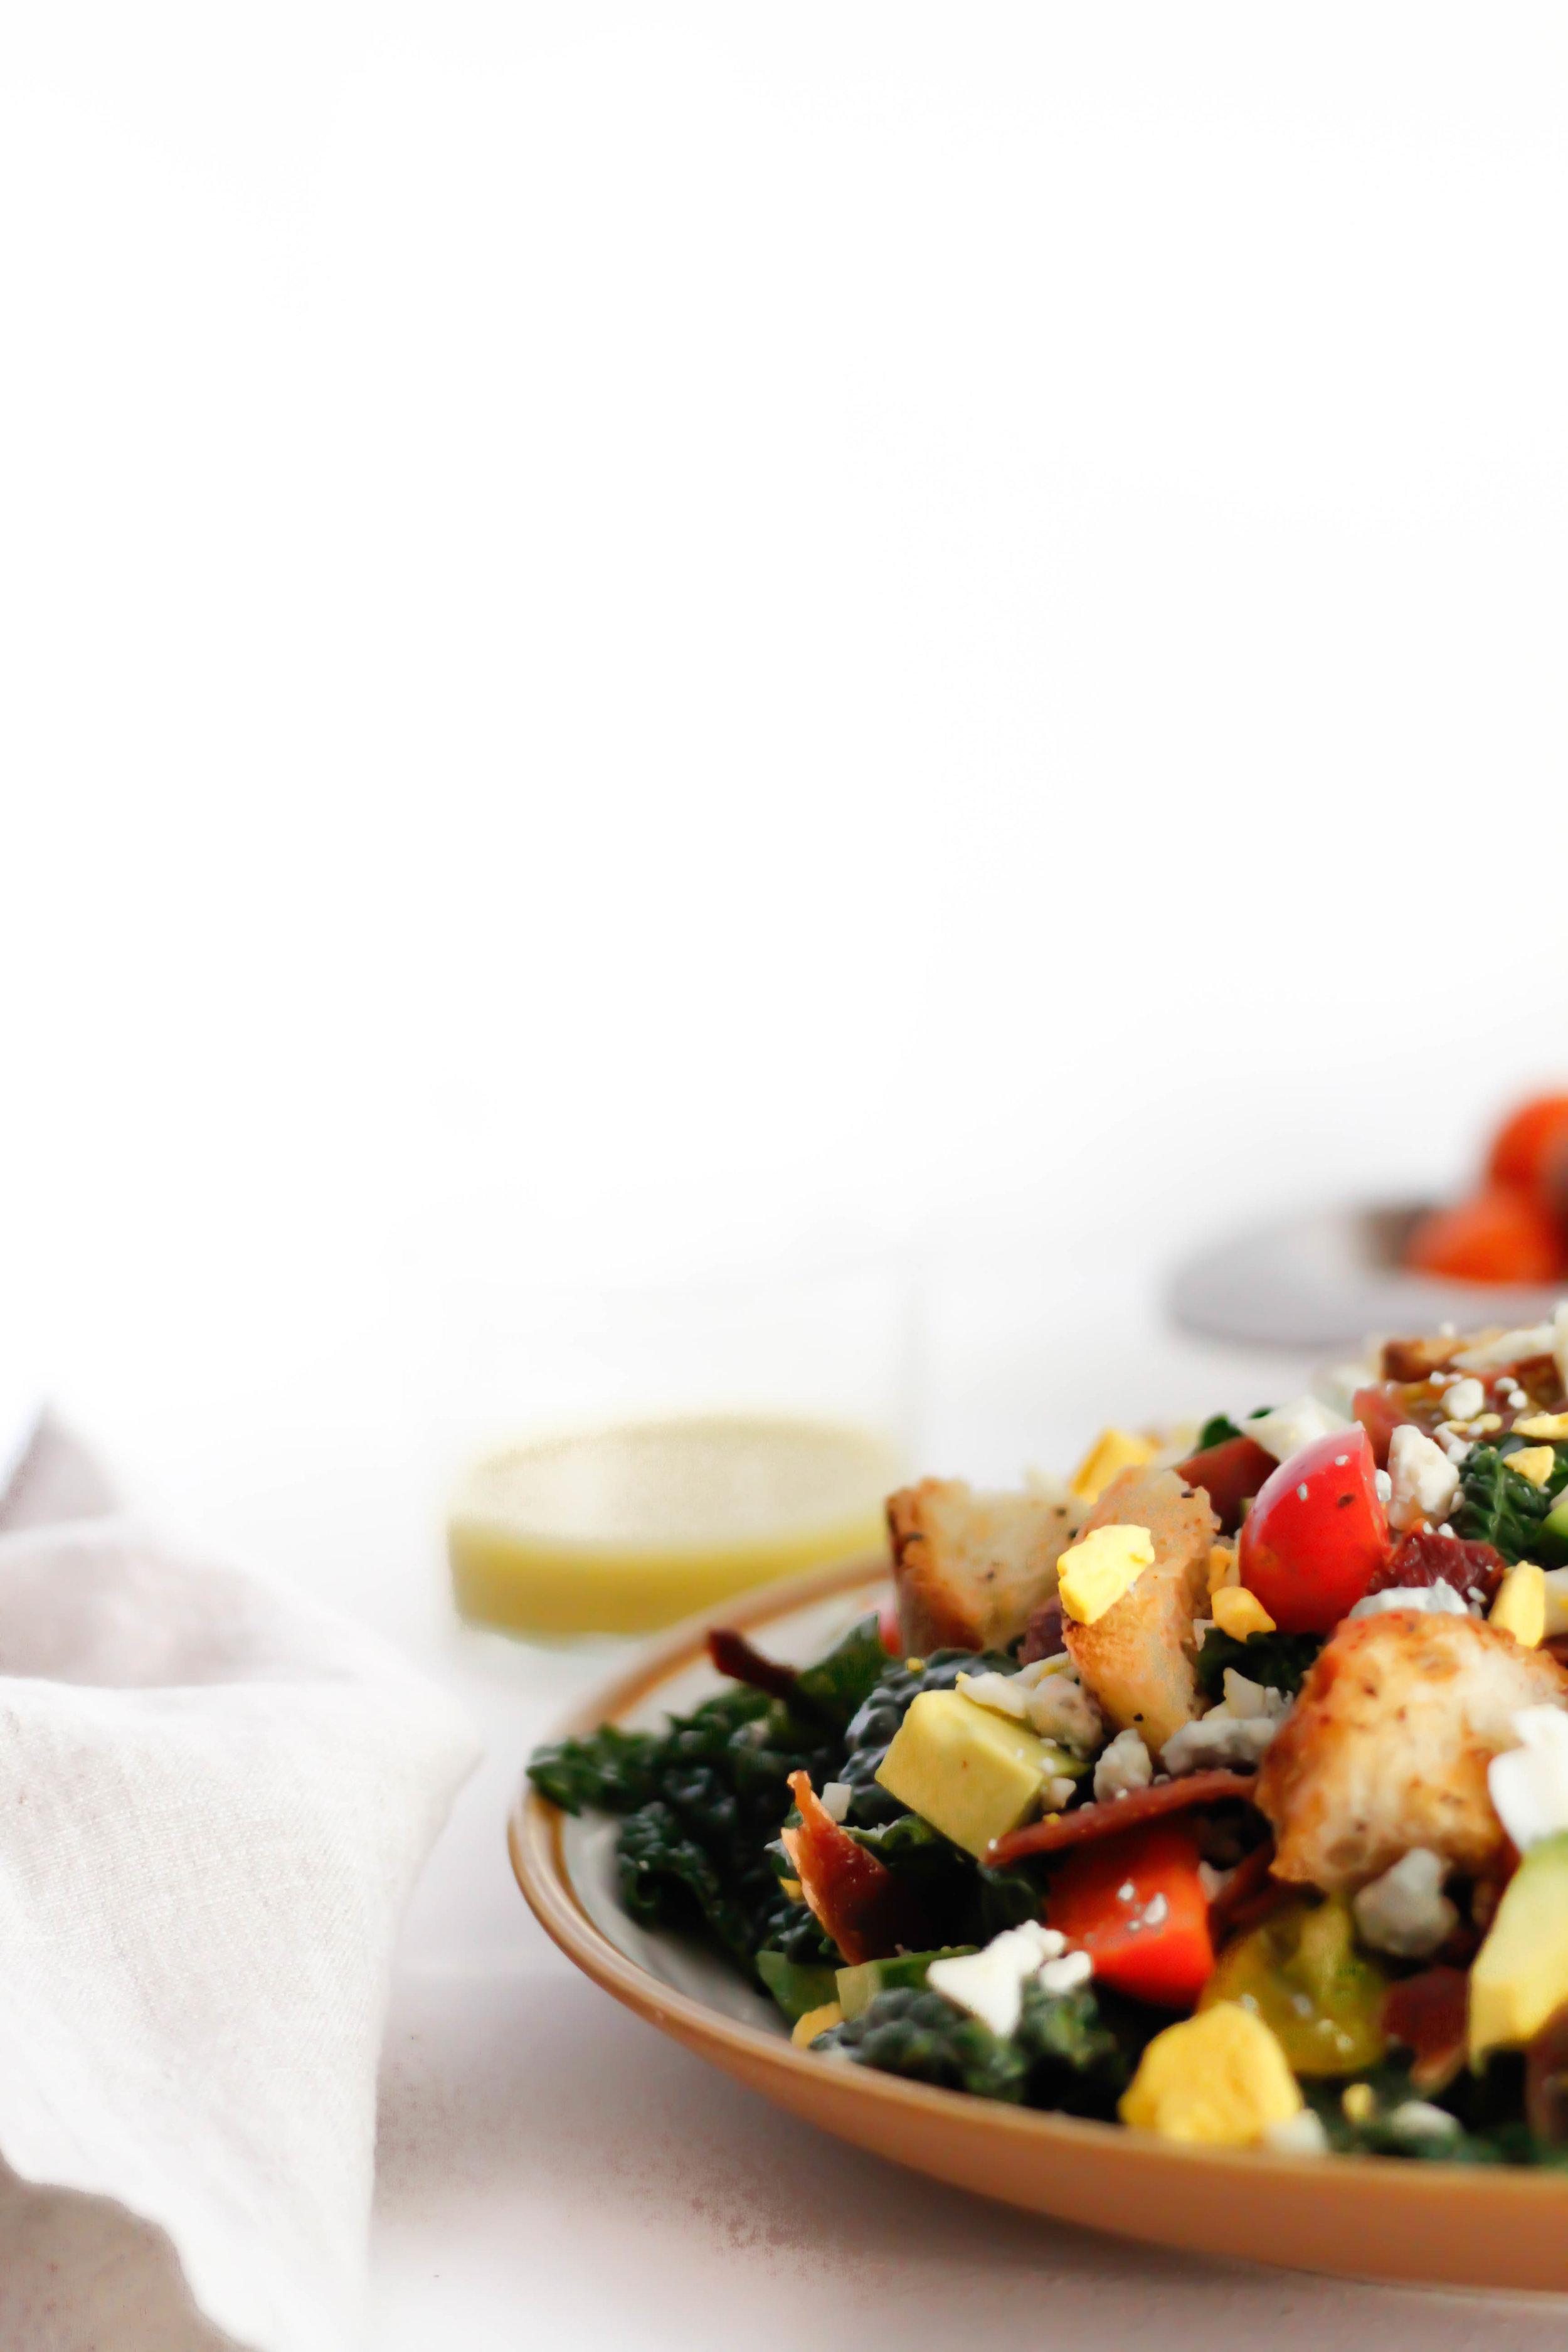 Copy of Kale cobb salad